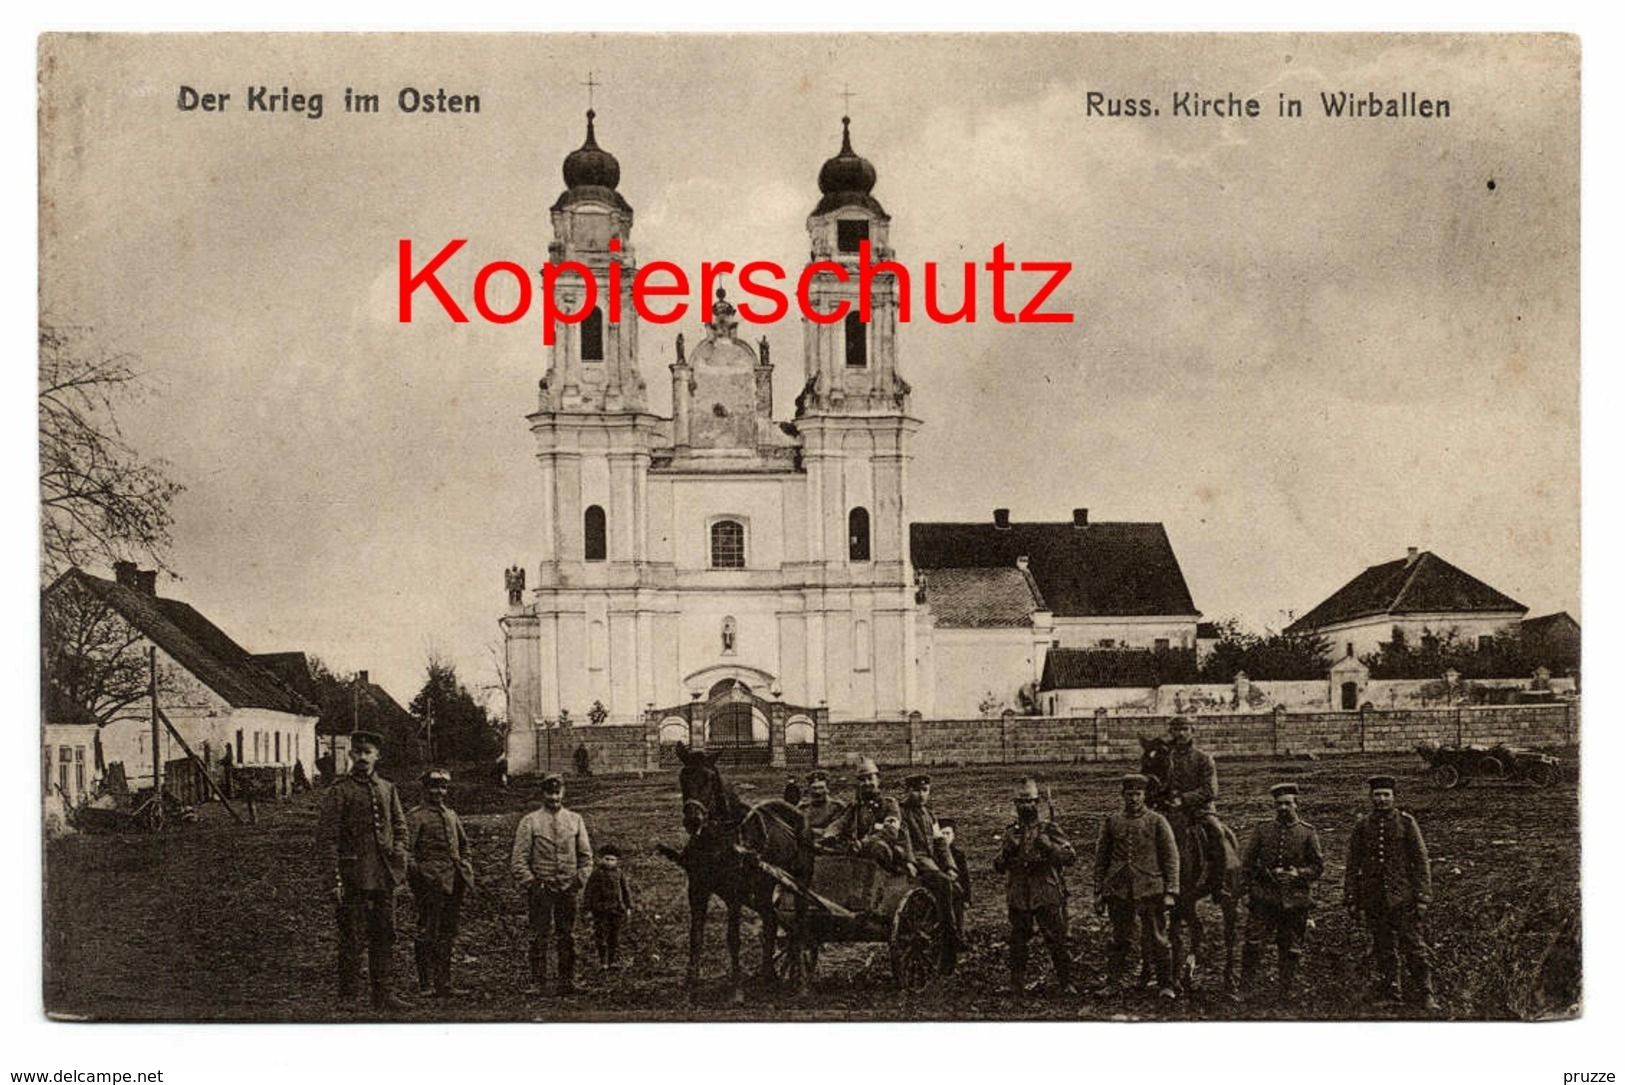 Wirballen - Virbalis Ca. 1915, Russ. Kirche - Litauen